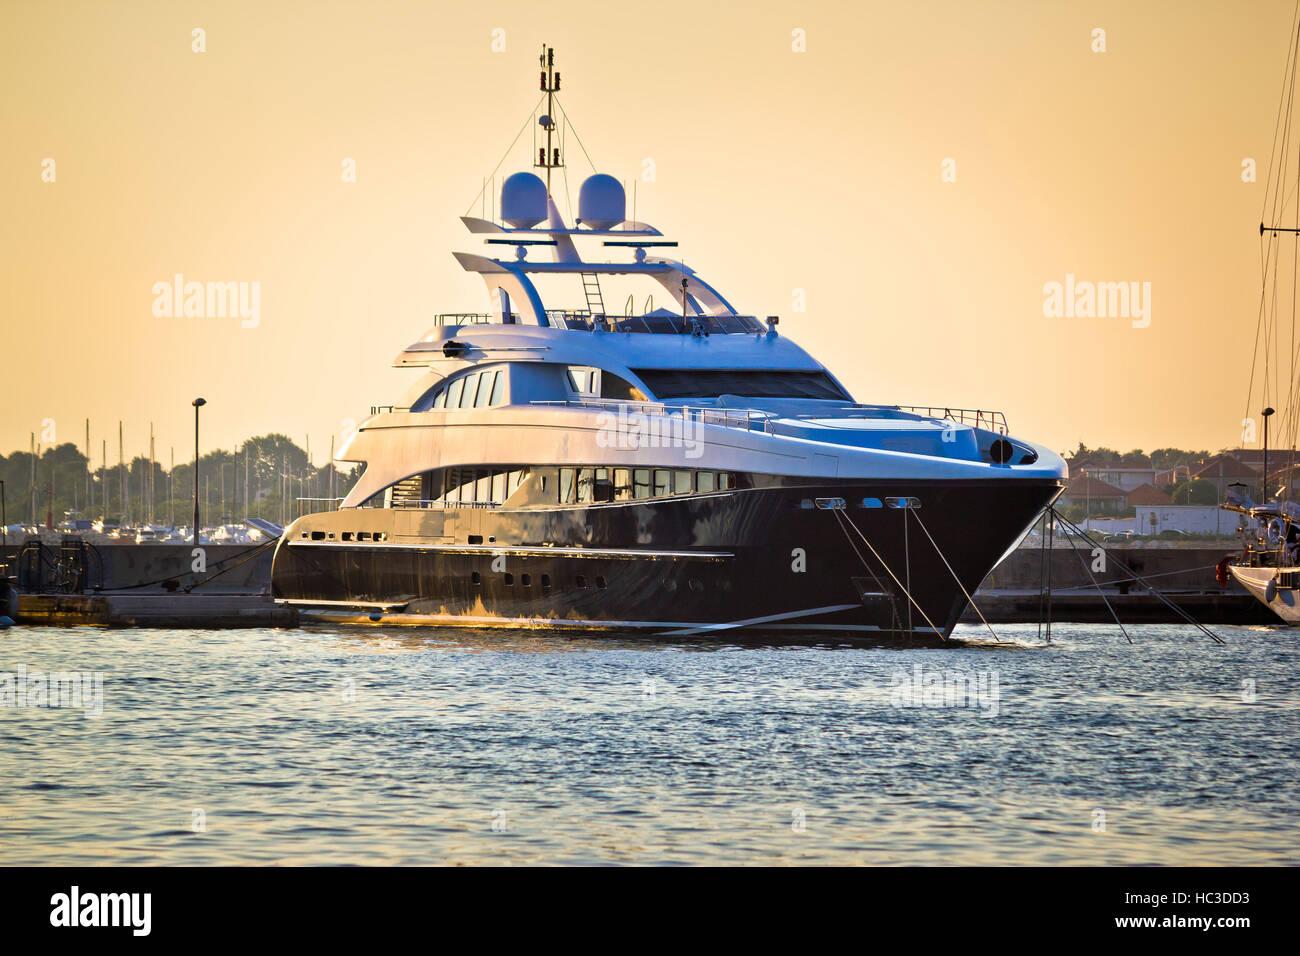 Luxury yacht in harbor on golden sunset - Stock Image